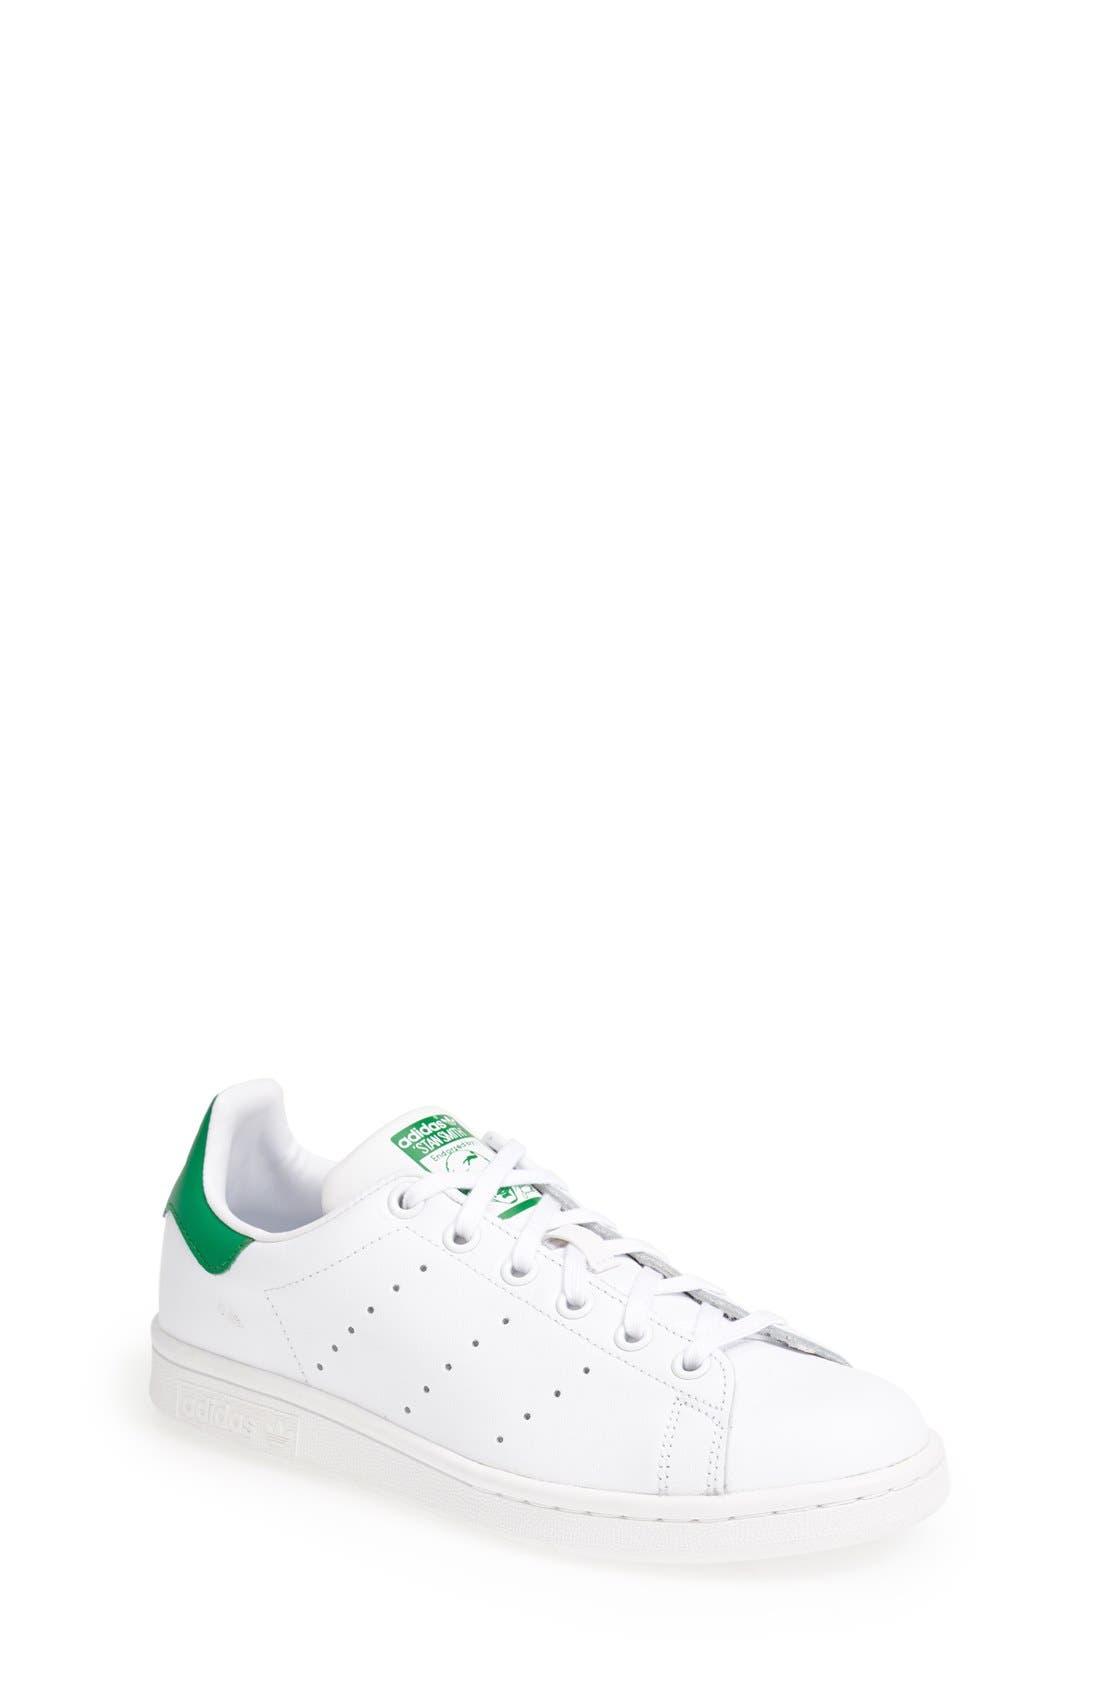 promo code 7f440 eb28f Adidas  Stan Smith  Leather Sneaker